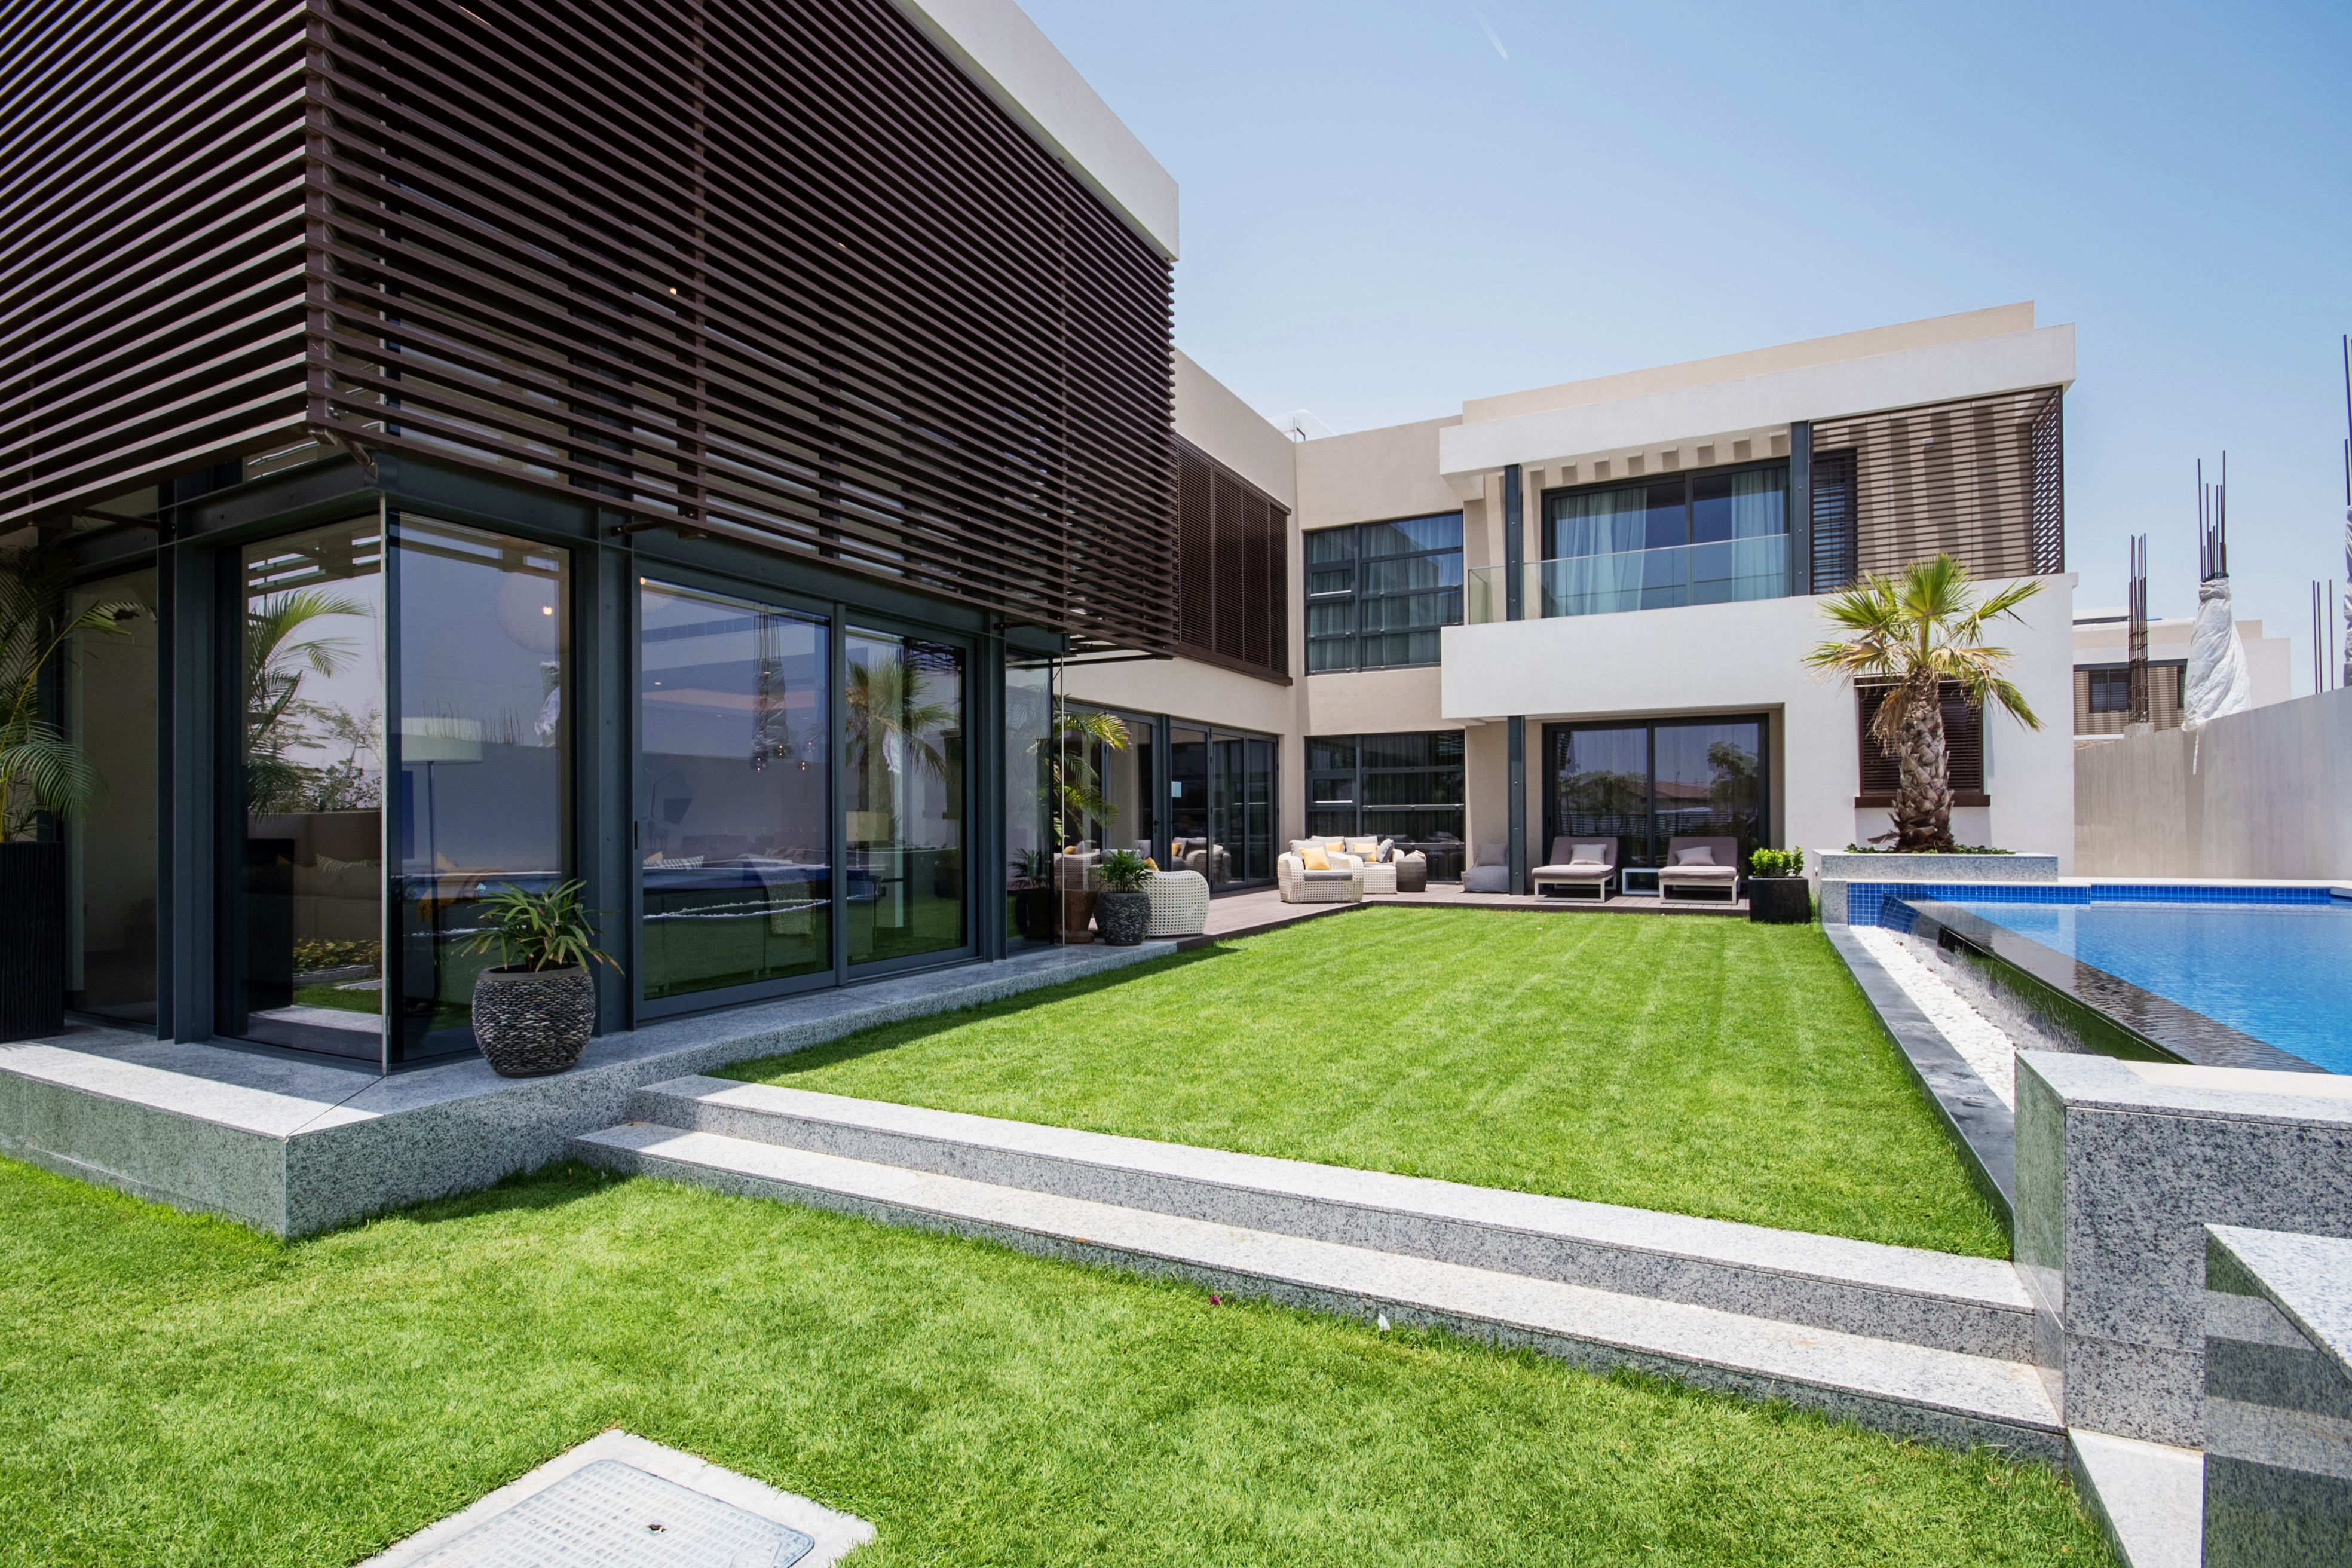 4 bedroom villa exterior (5)